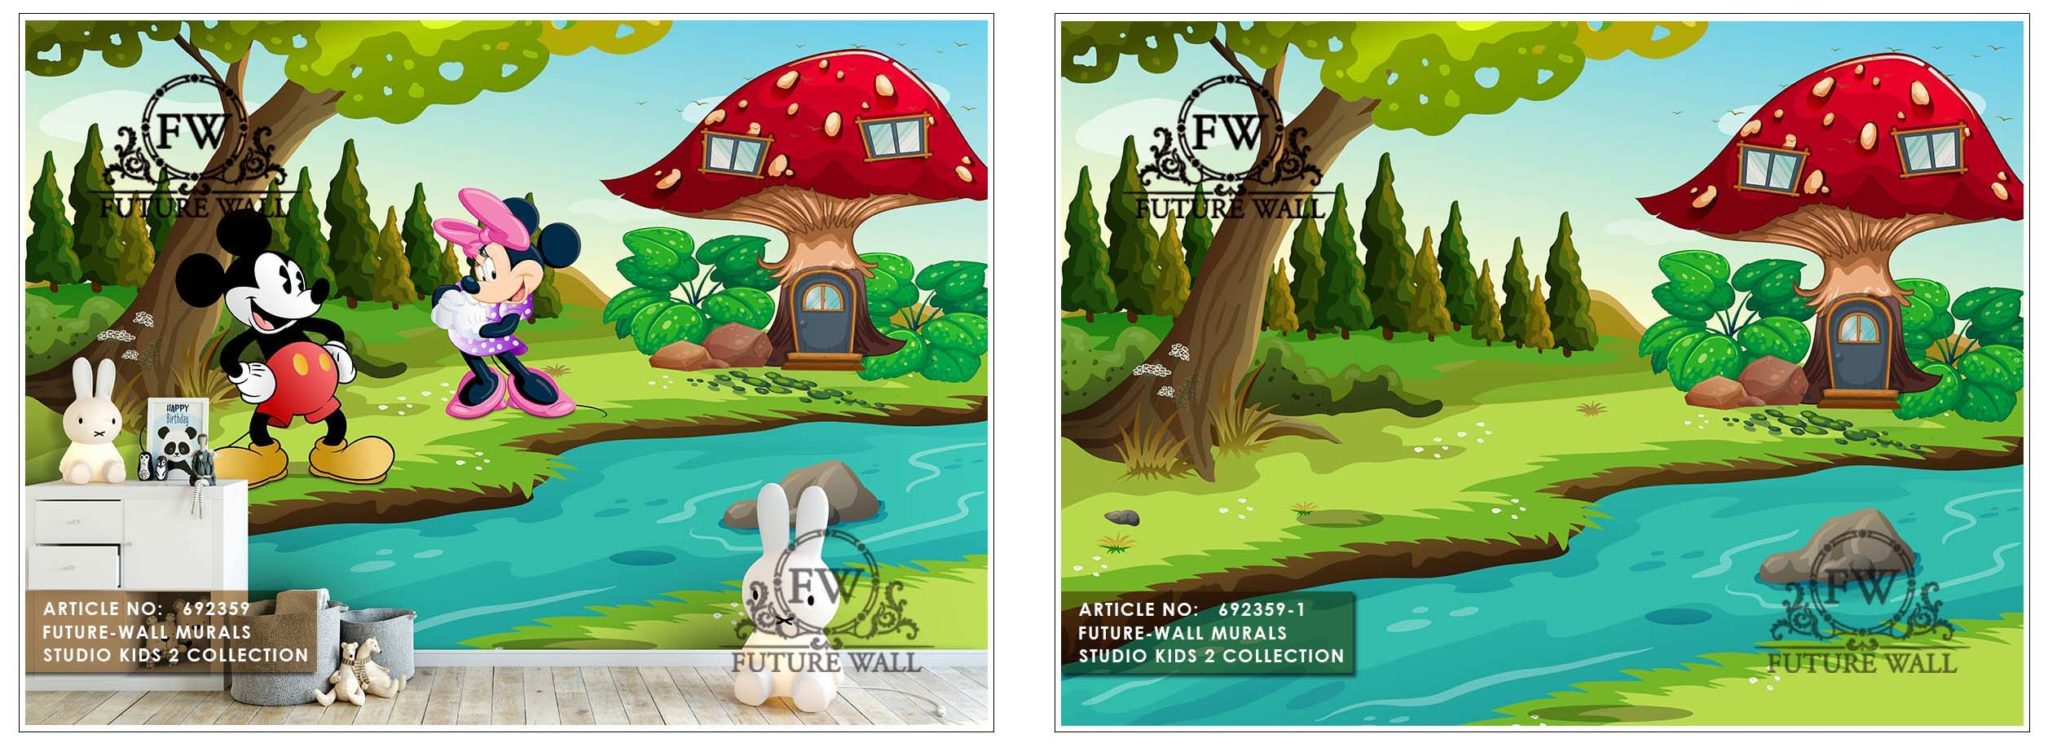 STUDIO-KIDS-2---BY-FUTUREWALL-MURALS-058